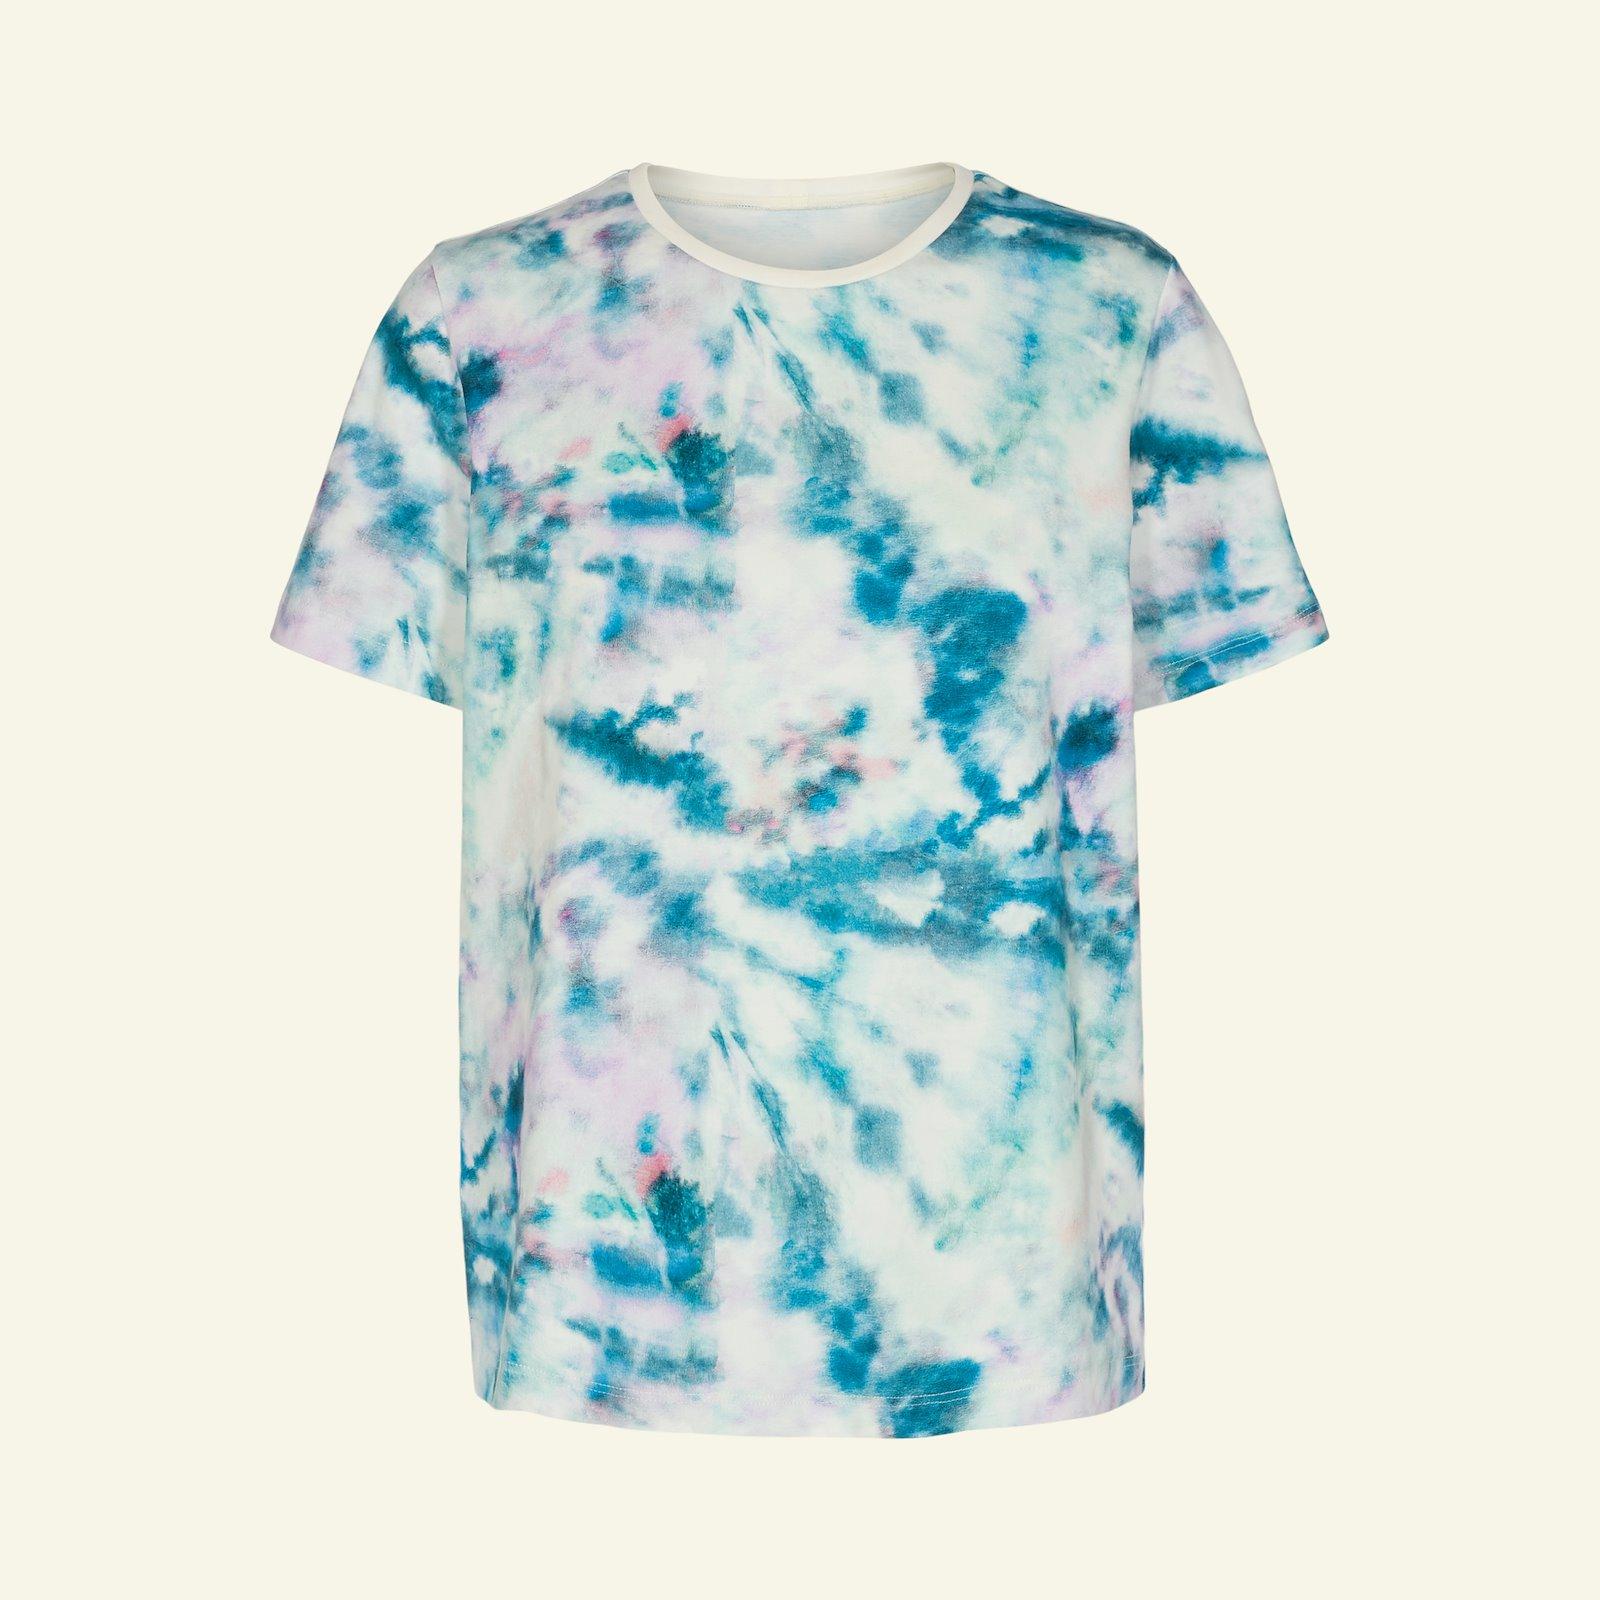 T-shirt and dress, 34/6 p22070_272729_sskit